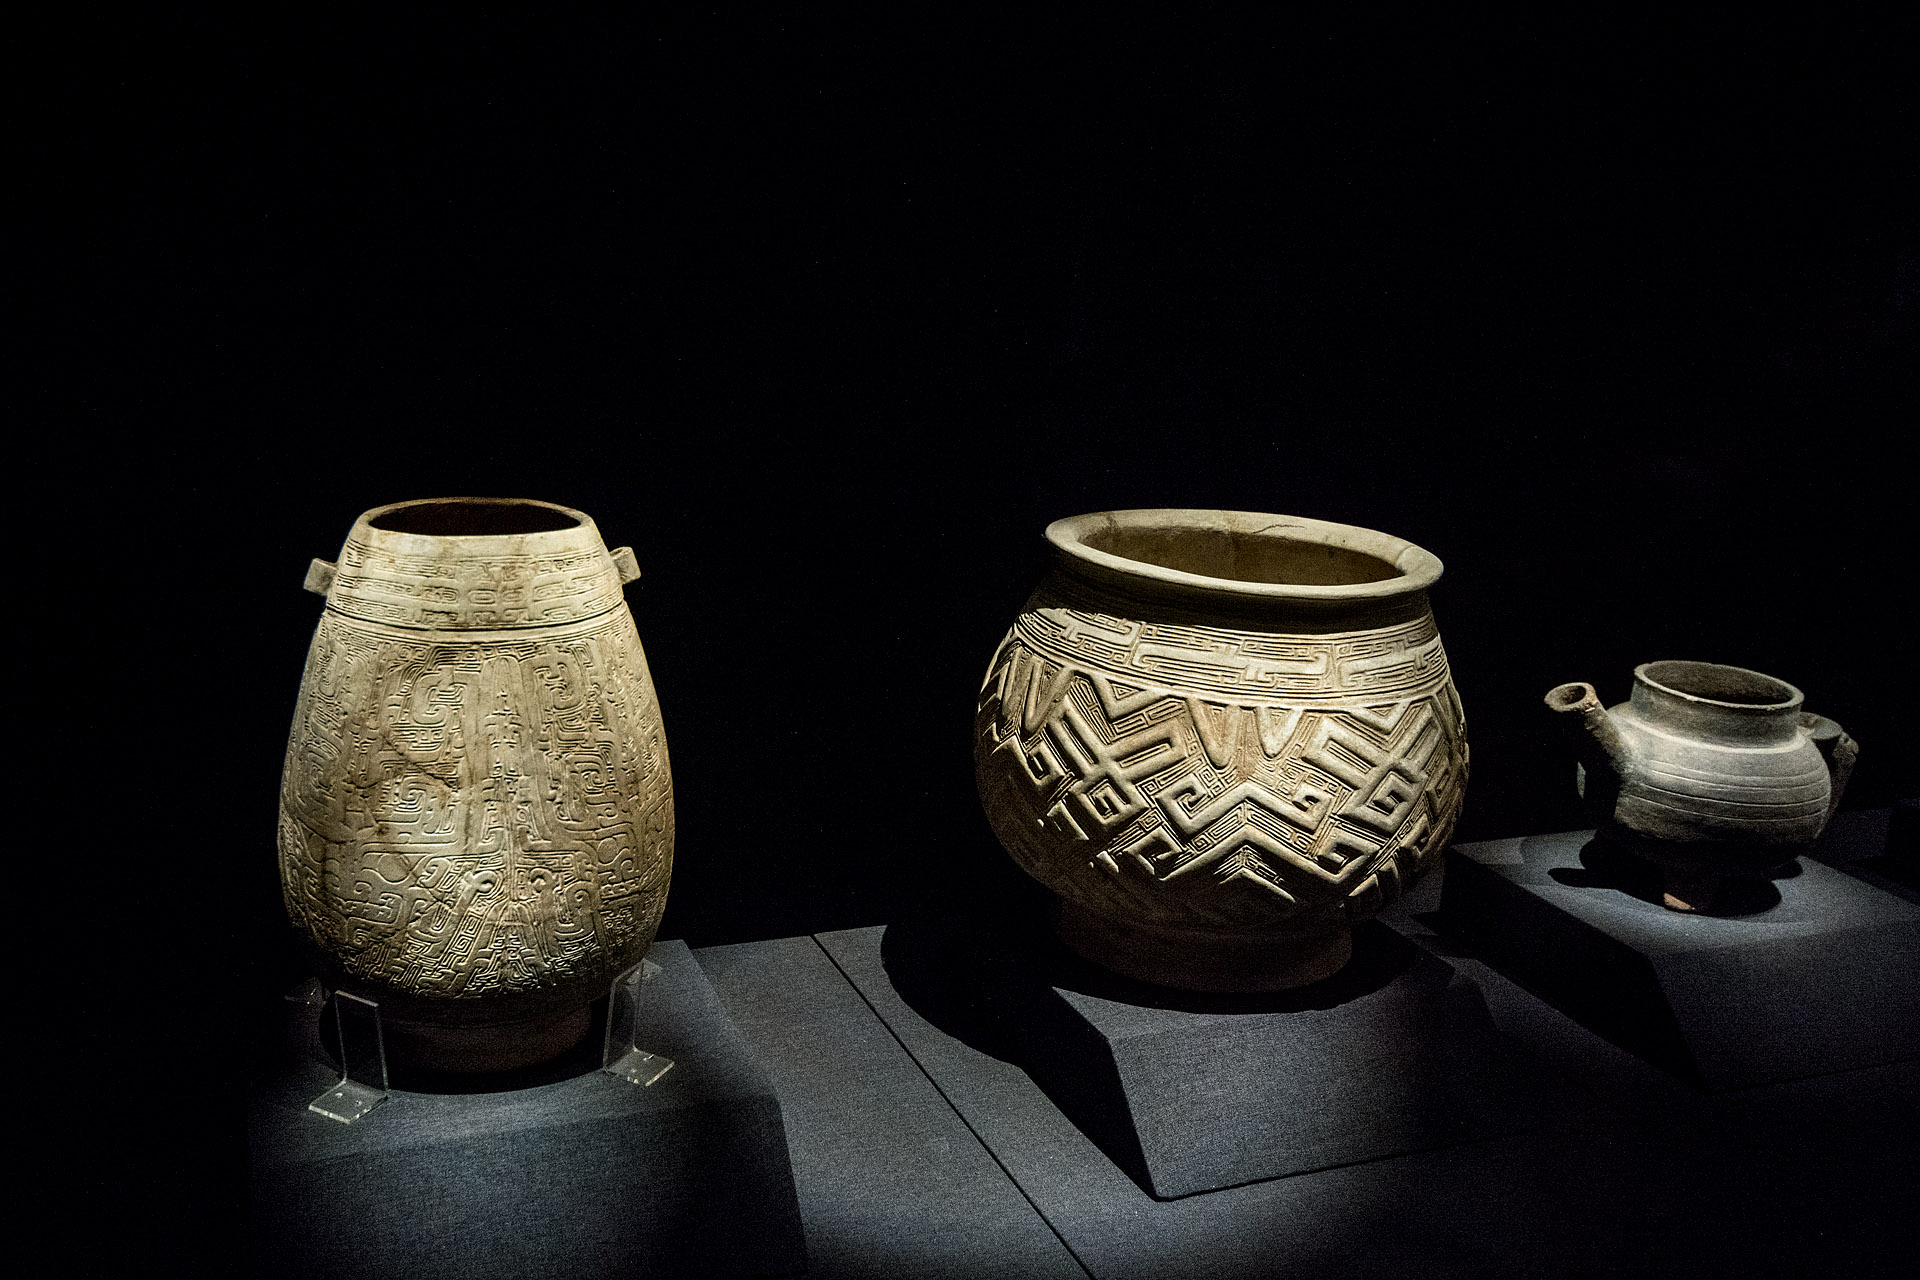 Shang, Zhou, Qin & Western Han Dynasties (1600 BCE - 220 AD)